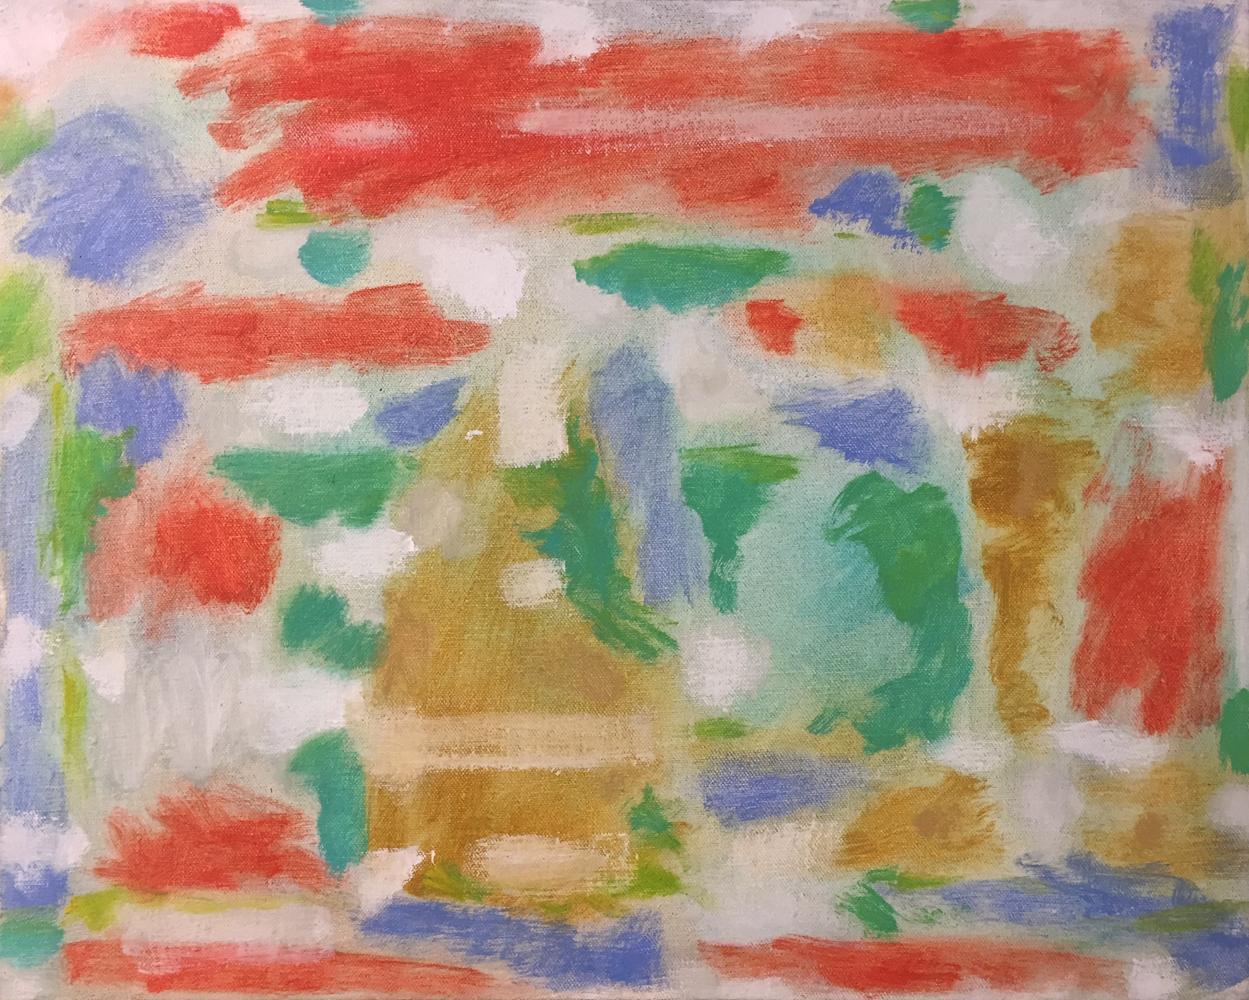 Robert C. Jones, Stimpson Island, 1969, oil on canvas, 16 x 20 inches, $4000.